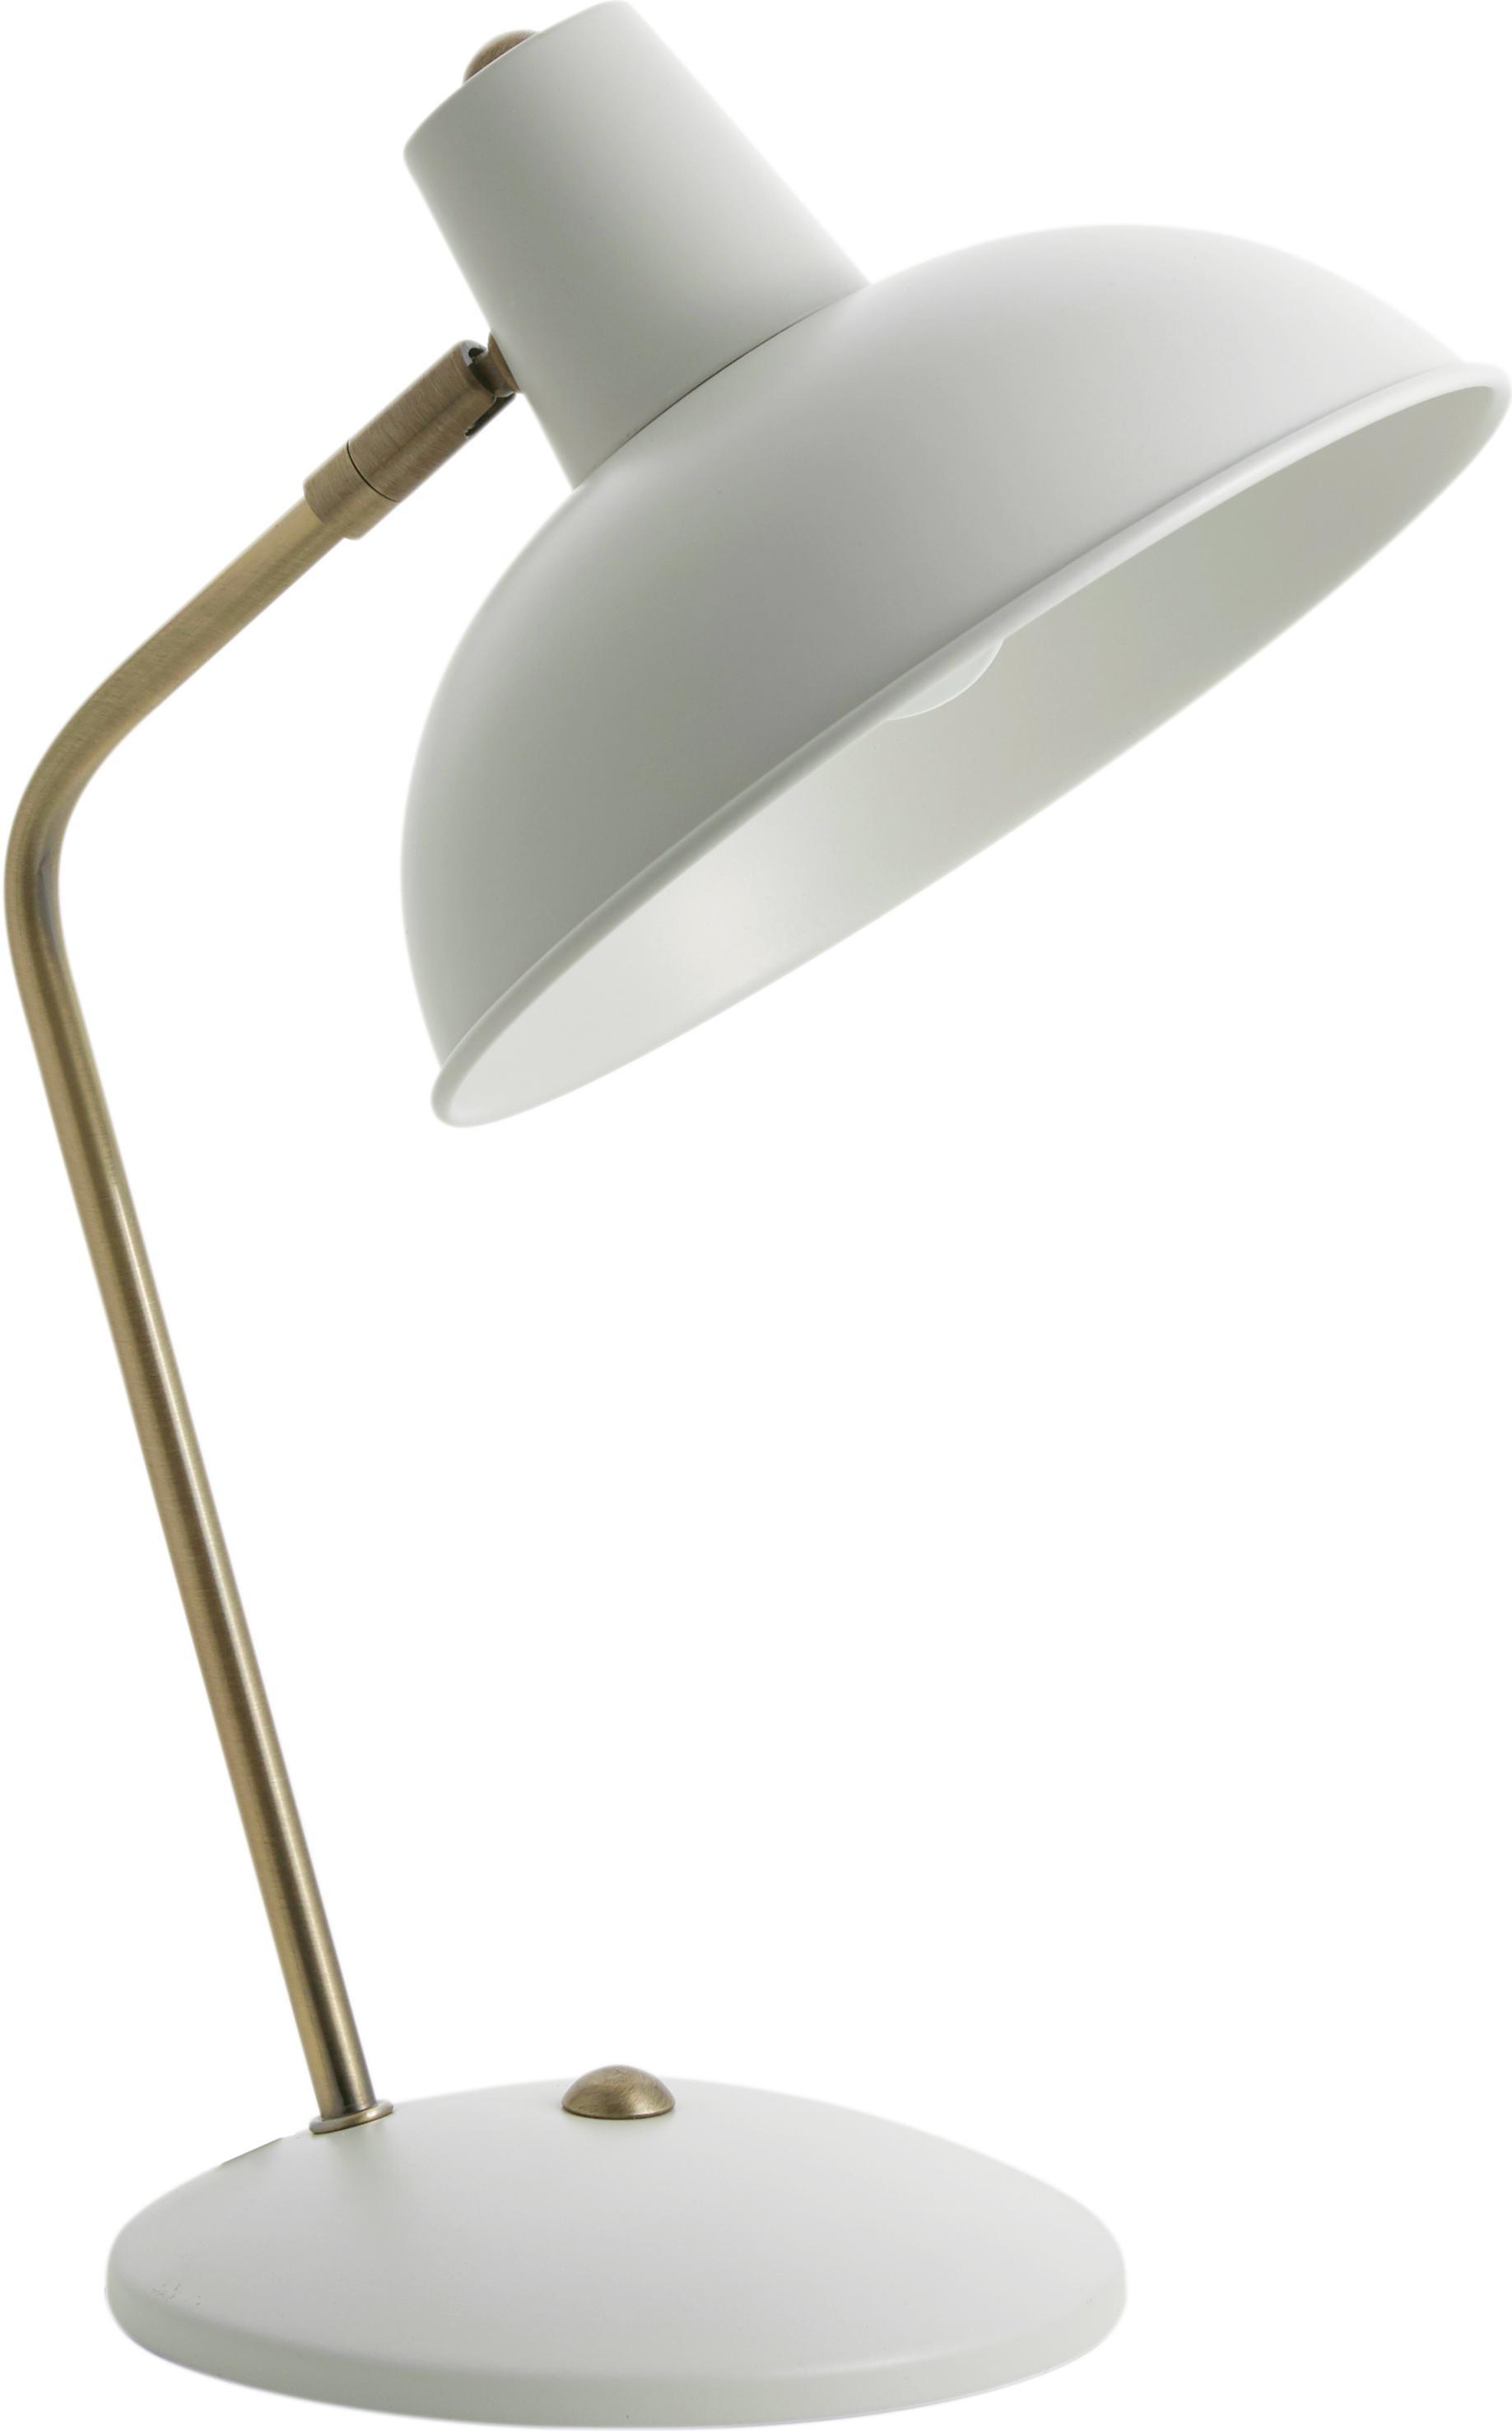 Lámpara de escritorio Hood, estilo retro, Pantalla: metal pintado, Cable: plástico, Blanco, latón, An 20 x Al 38 cm